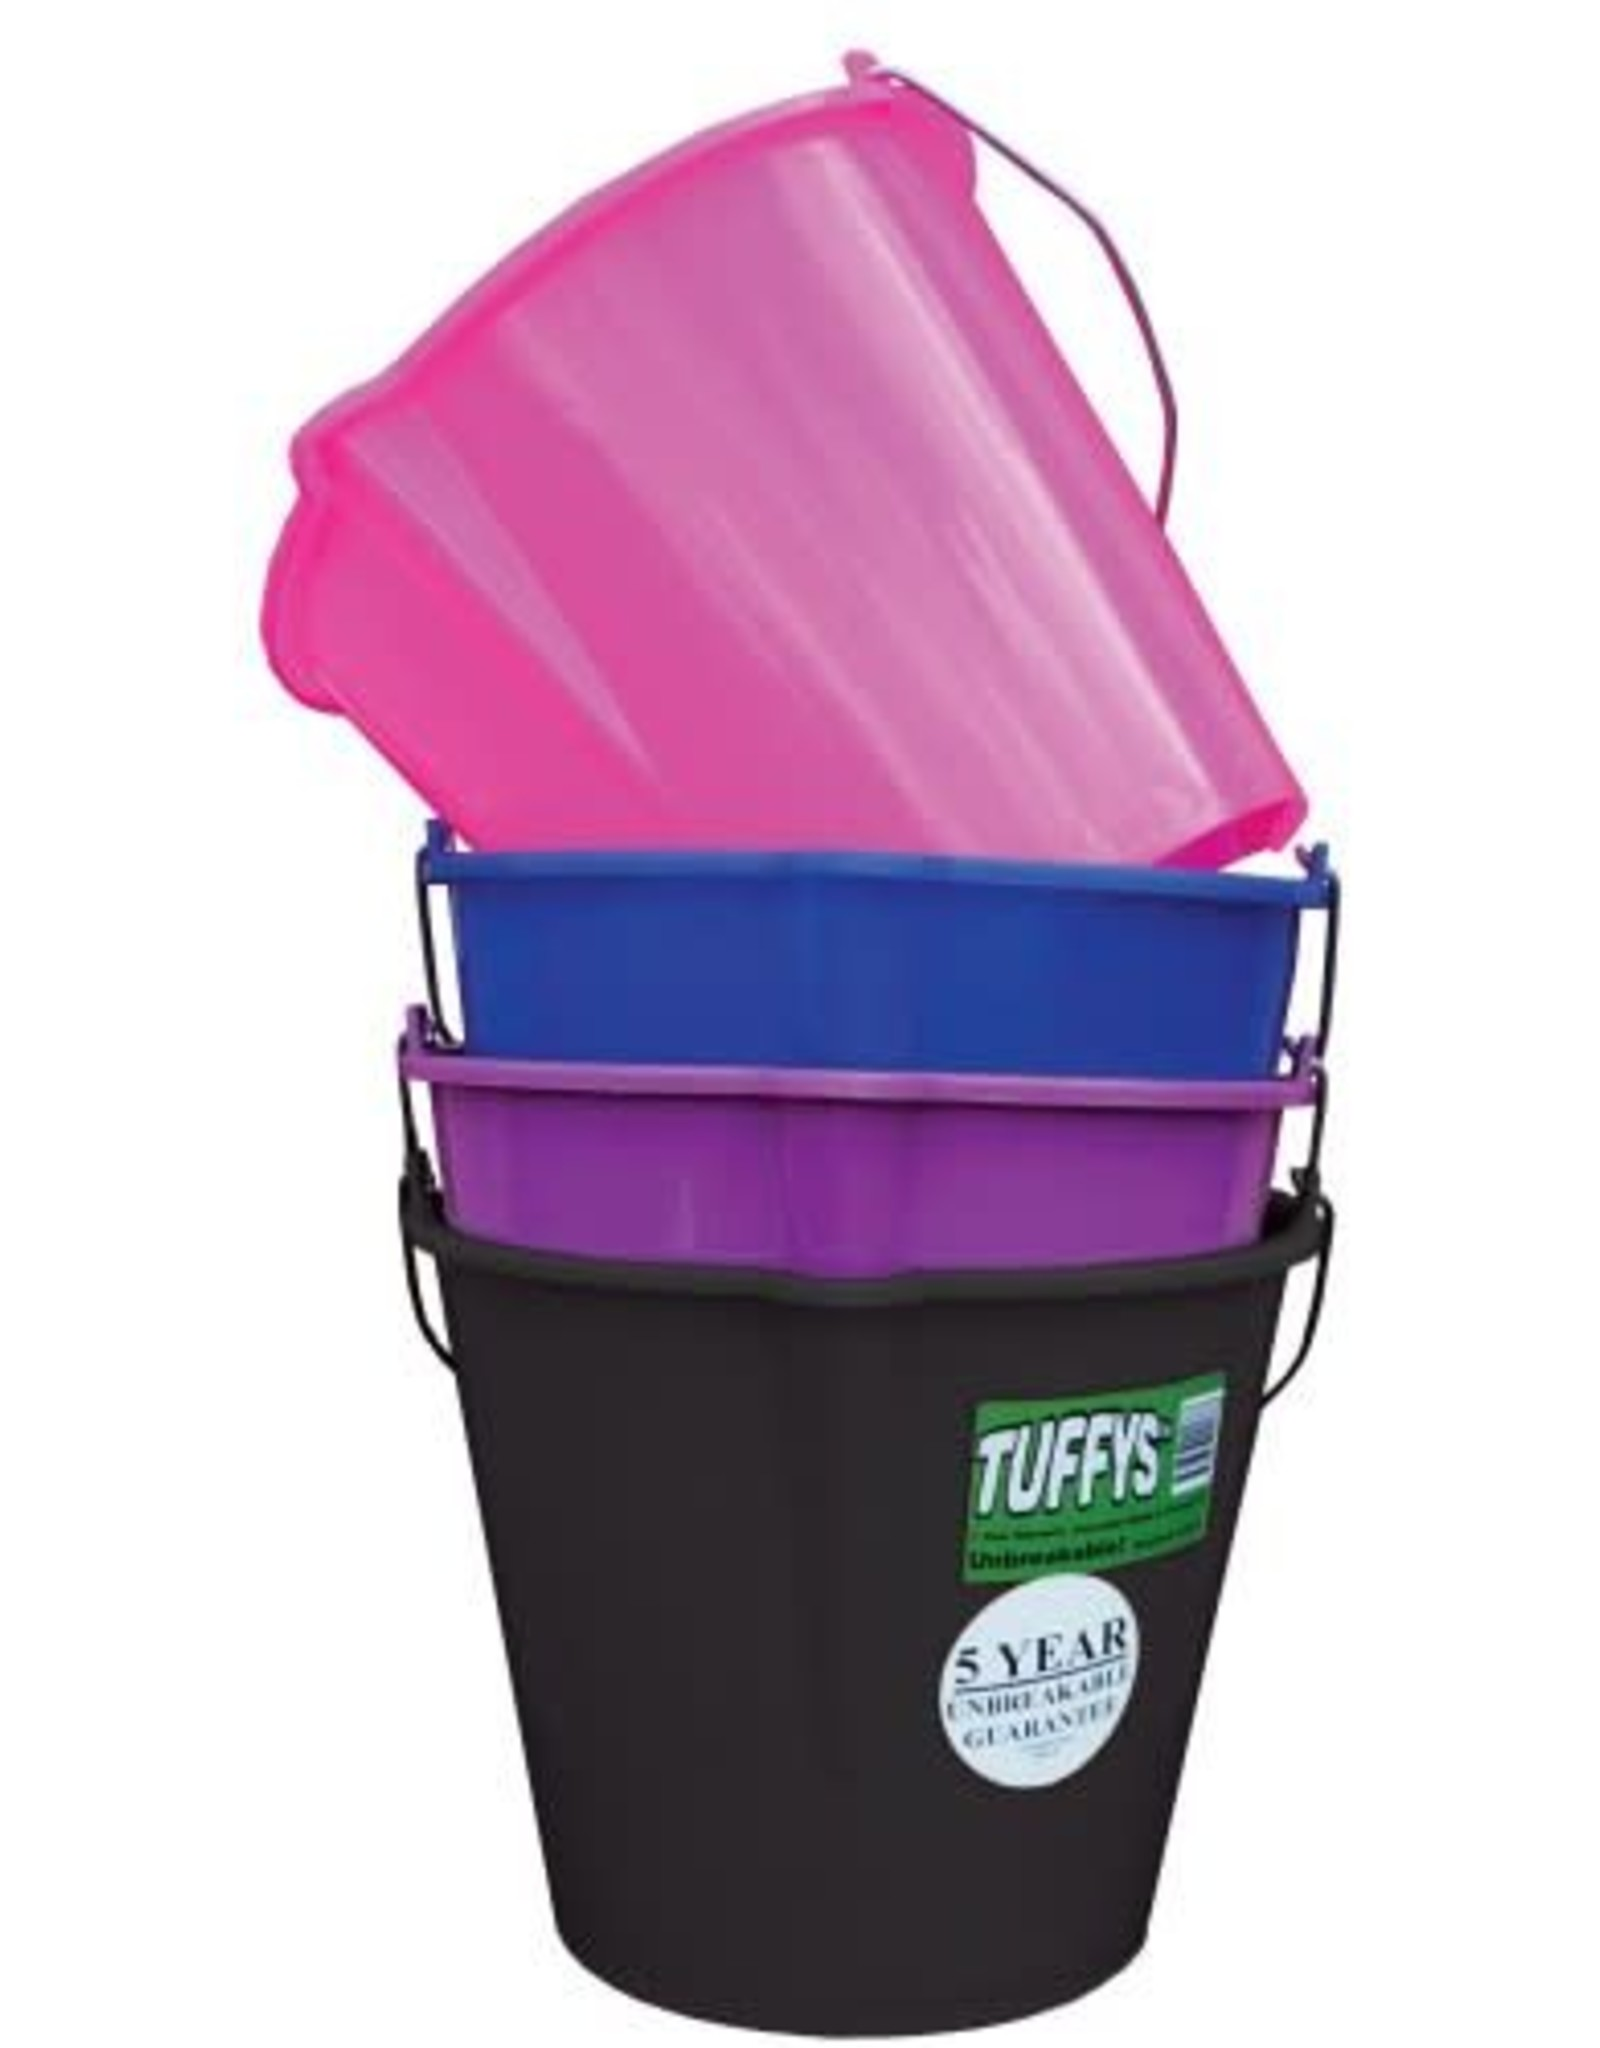 Tuffys Unbreakable Bucket - 10 Litre Capacity - Purple